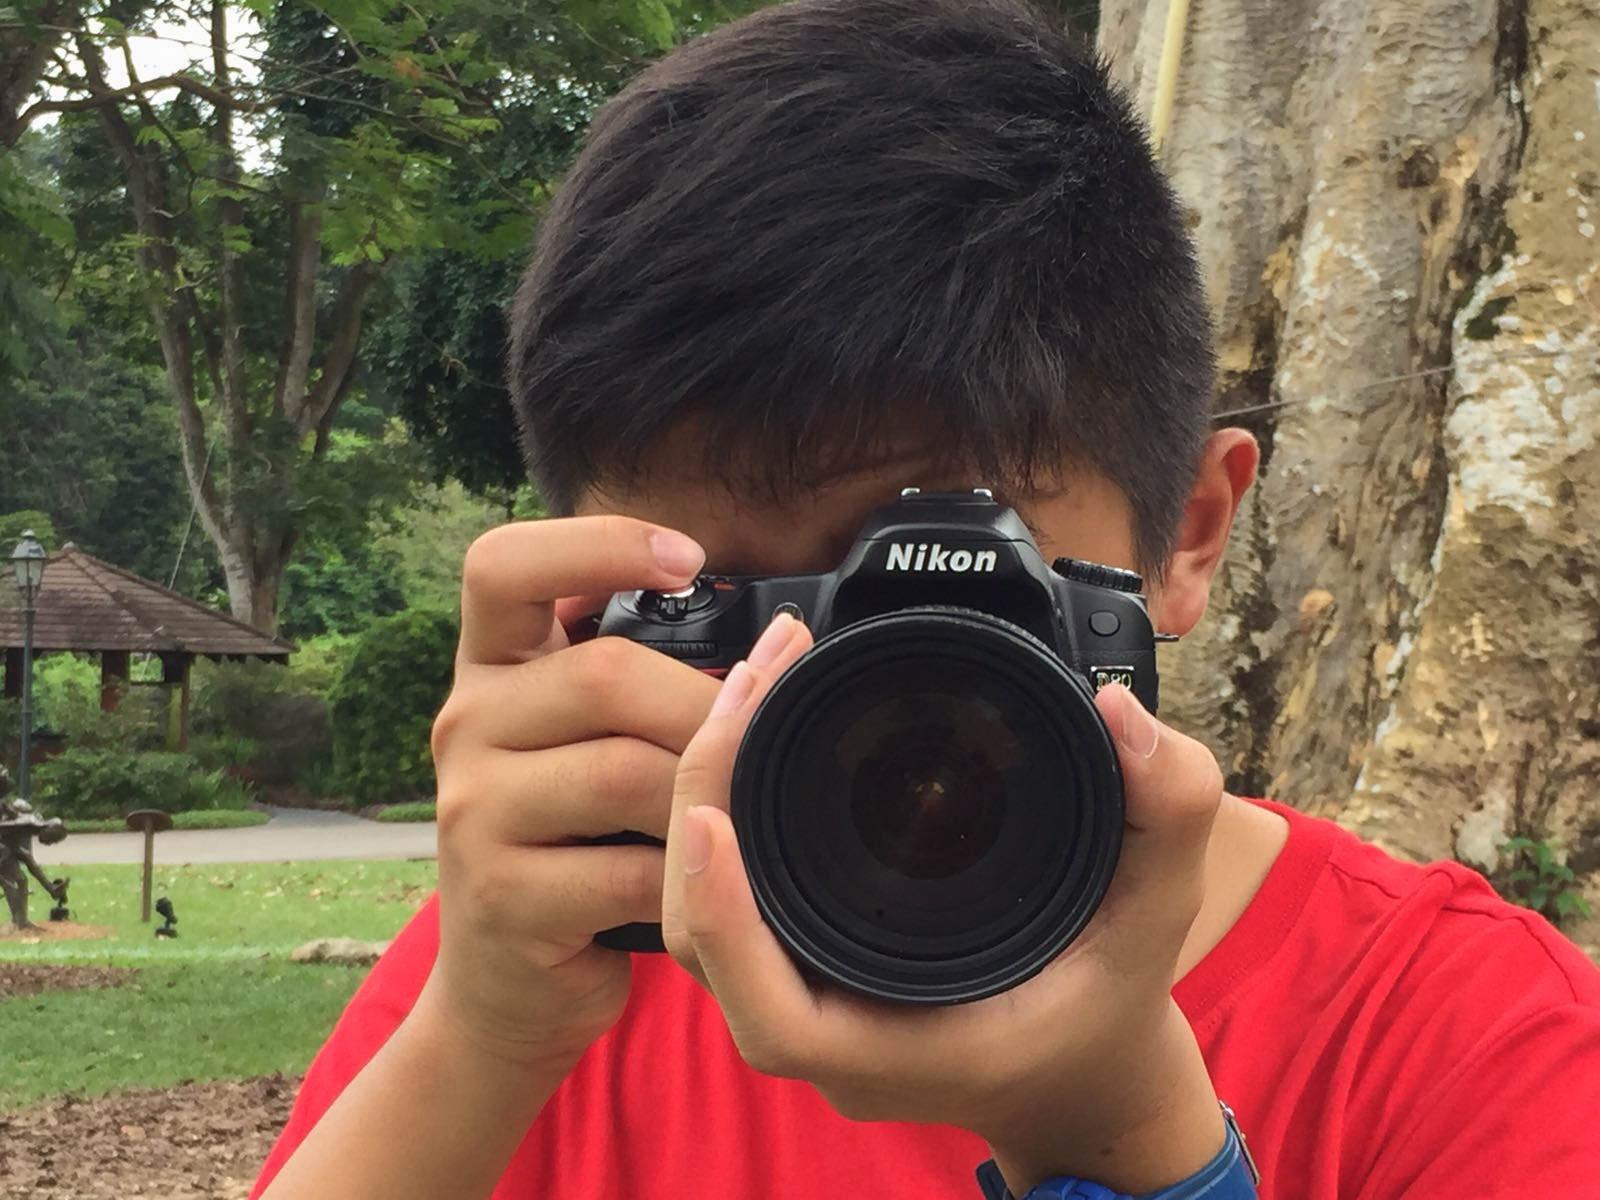 Go to Jarred Lin's profile